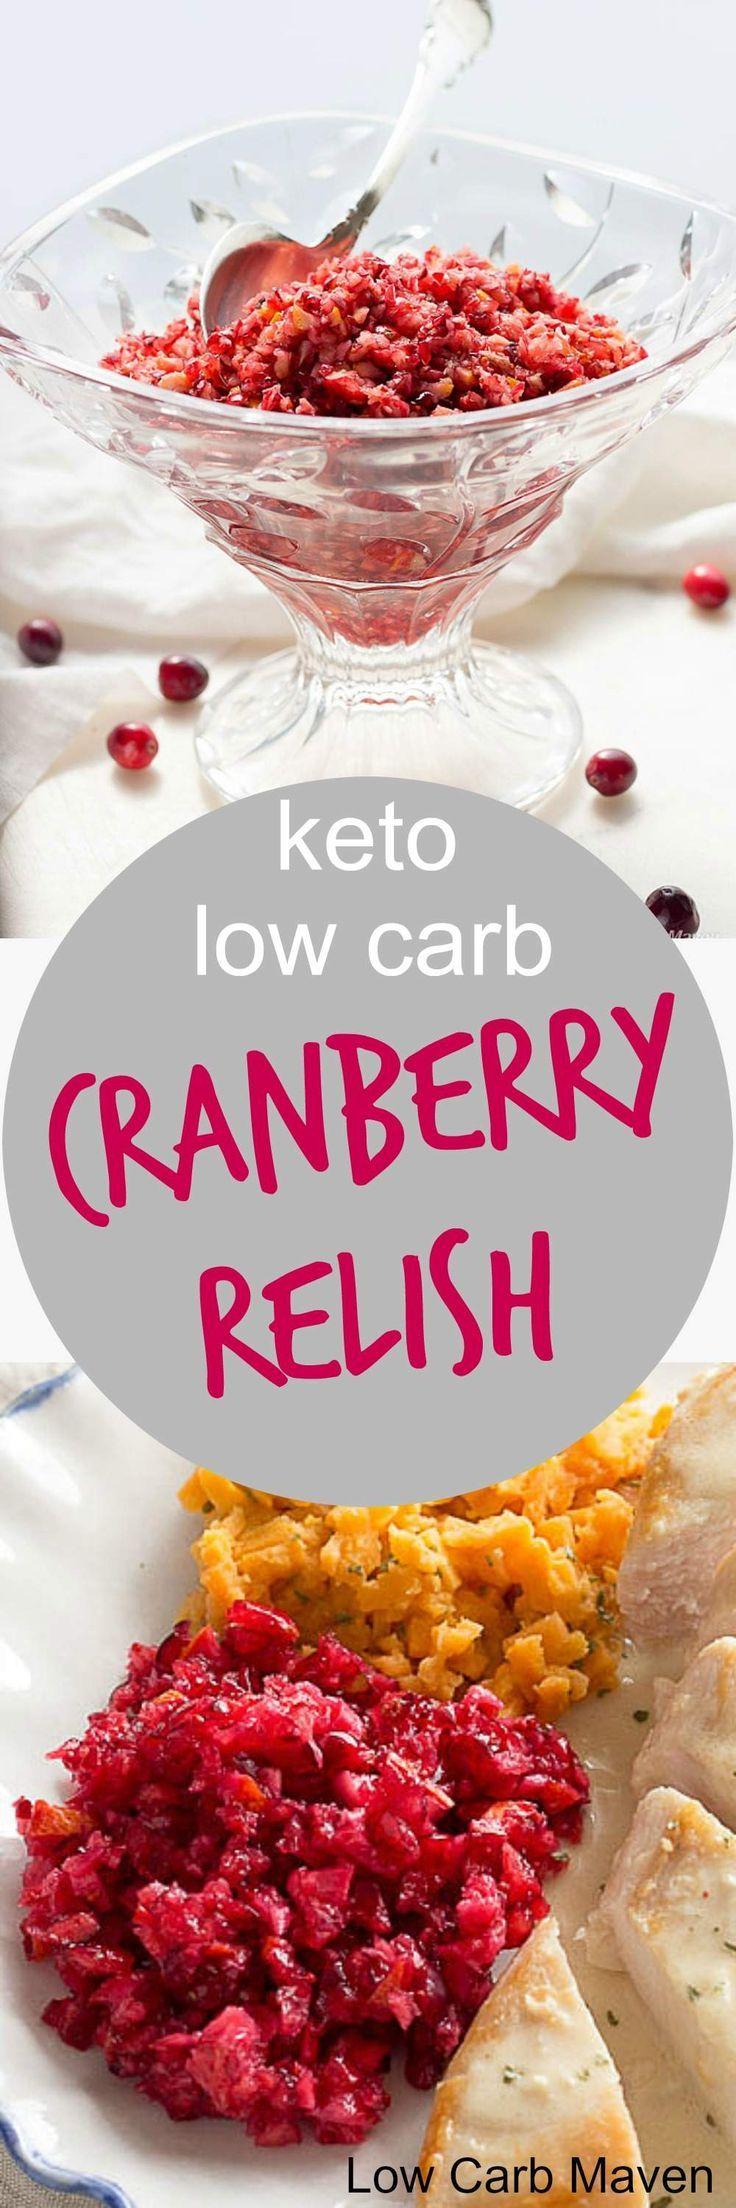 low carb cranberry relish keto recipe. Black Bedroom Furniture Sets. Home Design Ideas